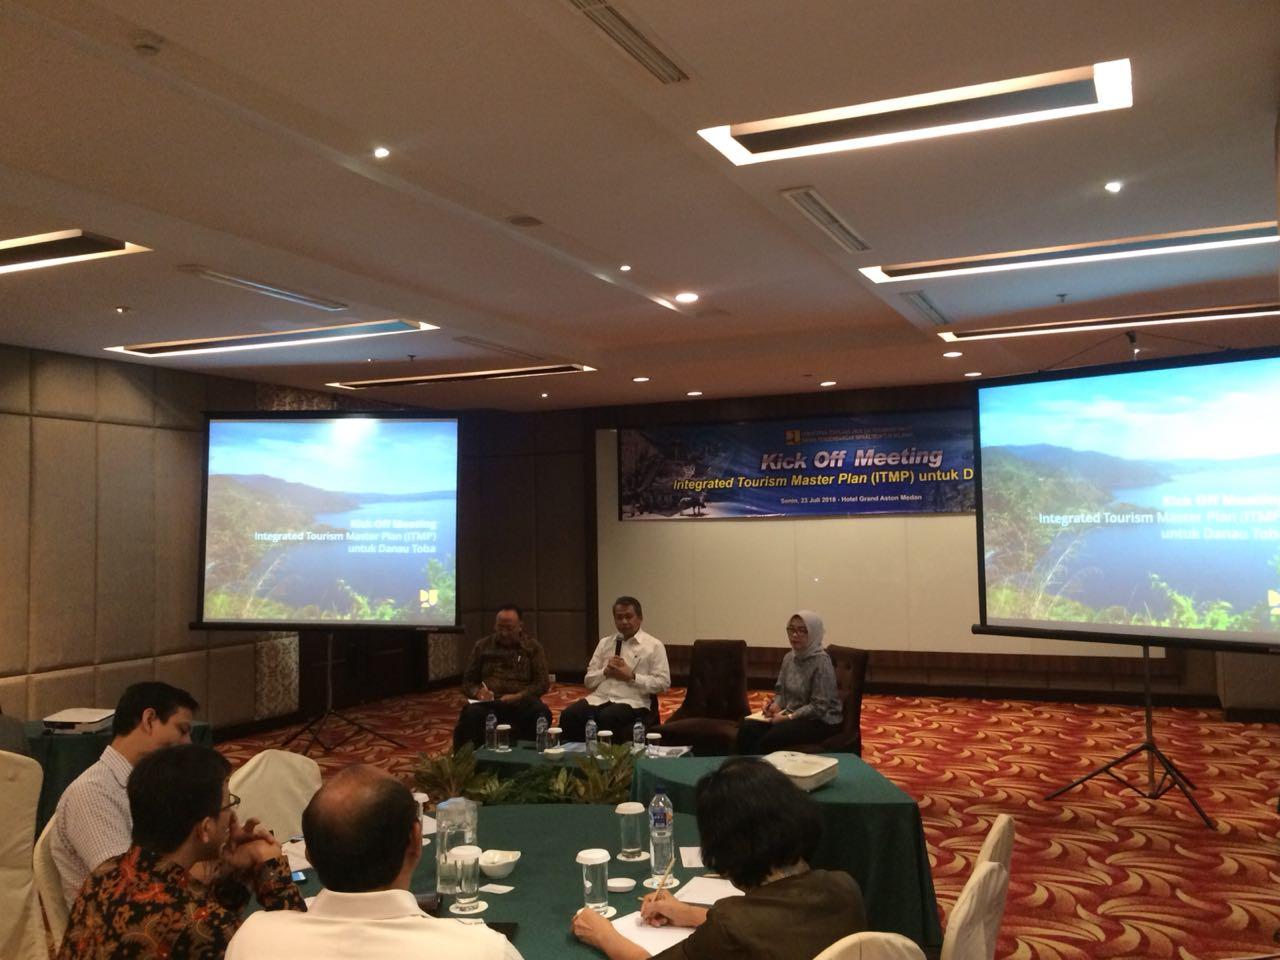 Kegiatan Kick Off Meeting ITMP for Lake Toba dipimpin oleh Bapak Kuswardono, Kepala Pusat Pengembangan Kawasan Strategis